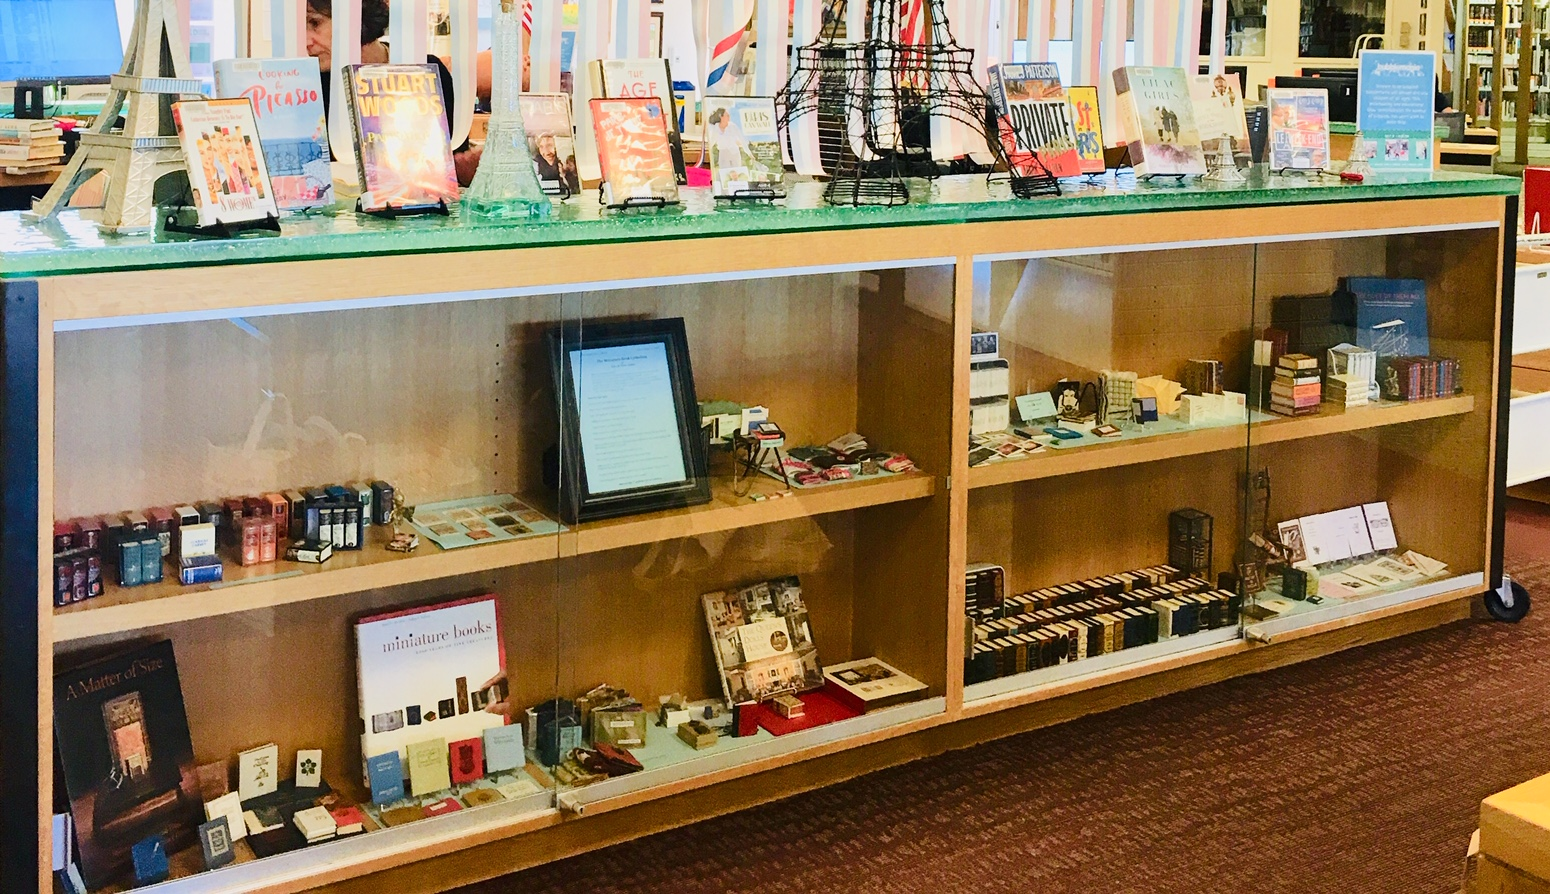 Eileen Verbs Books: SUMMER 2019 EXHIBITION OF MINIATURE BOOKS!